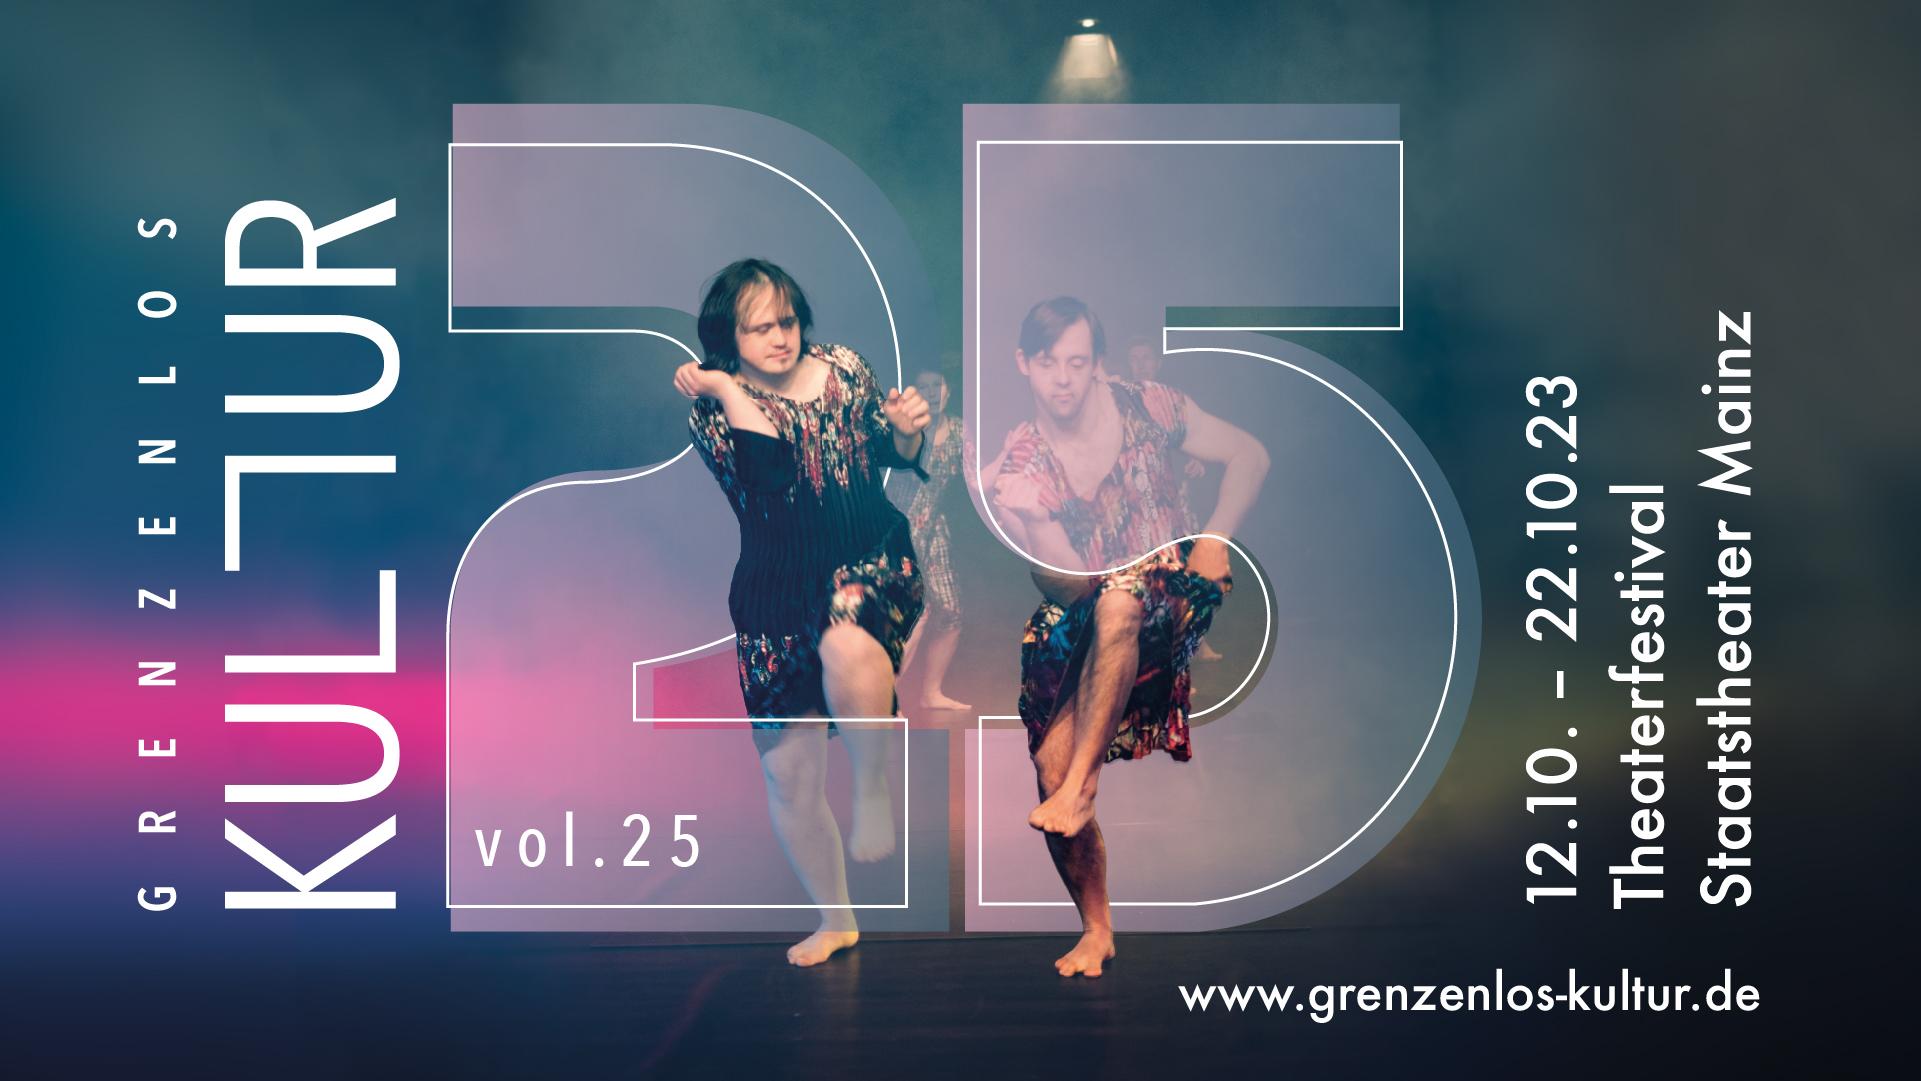 Grenzenlos Kultur vol. 20 - Theaterfestival in Mainz